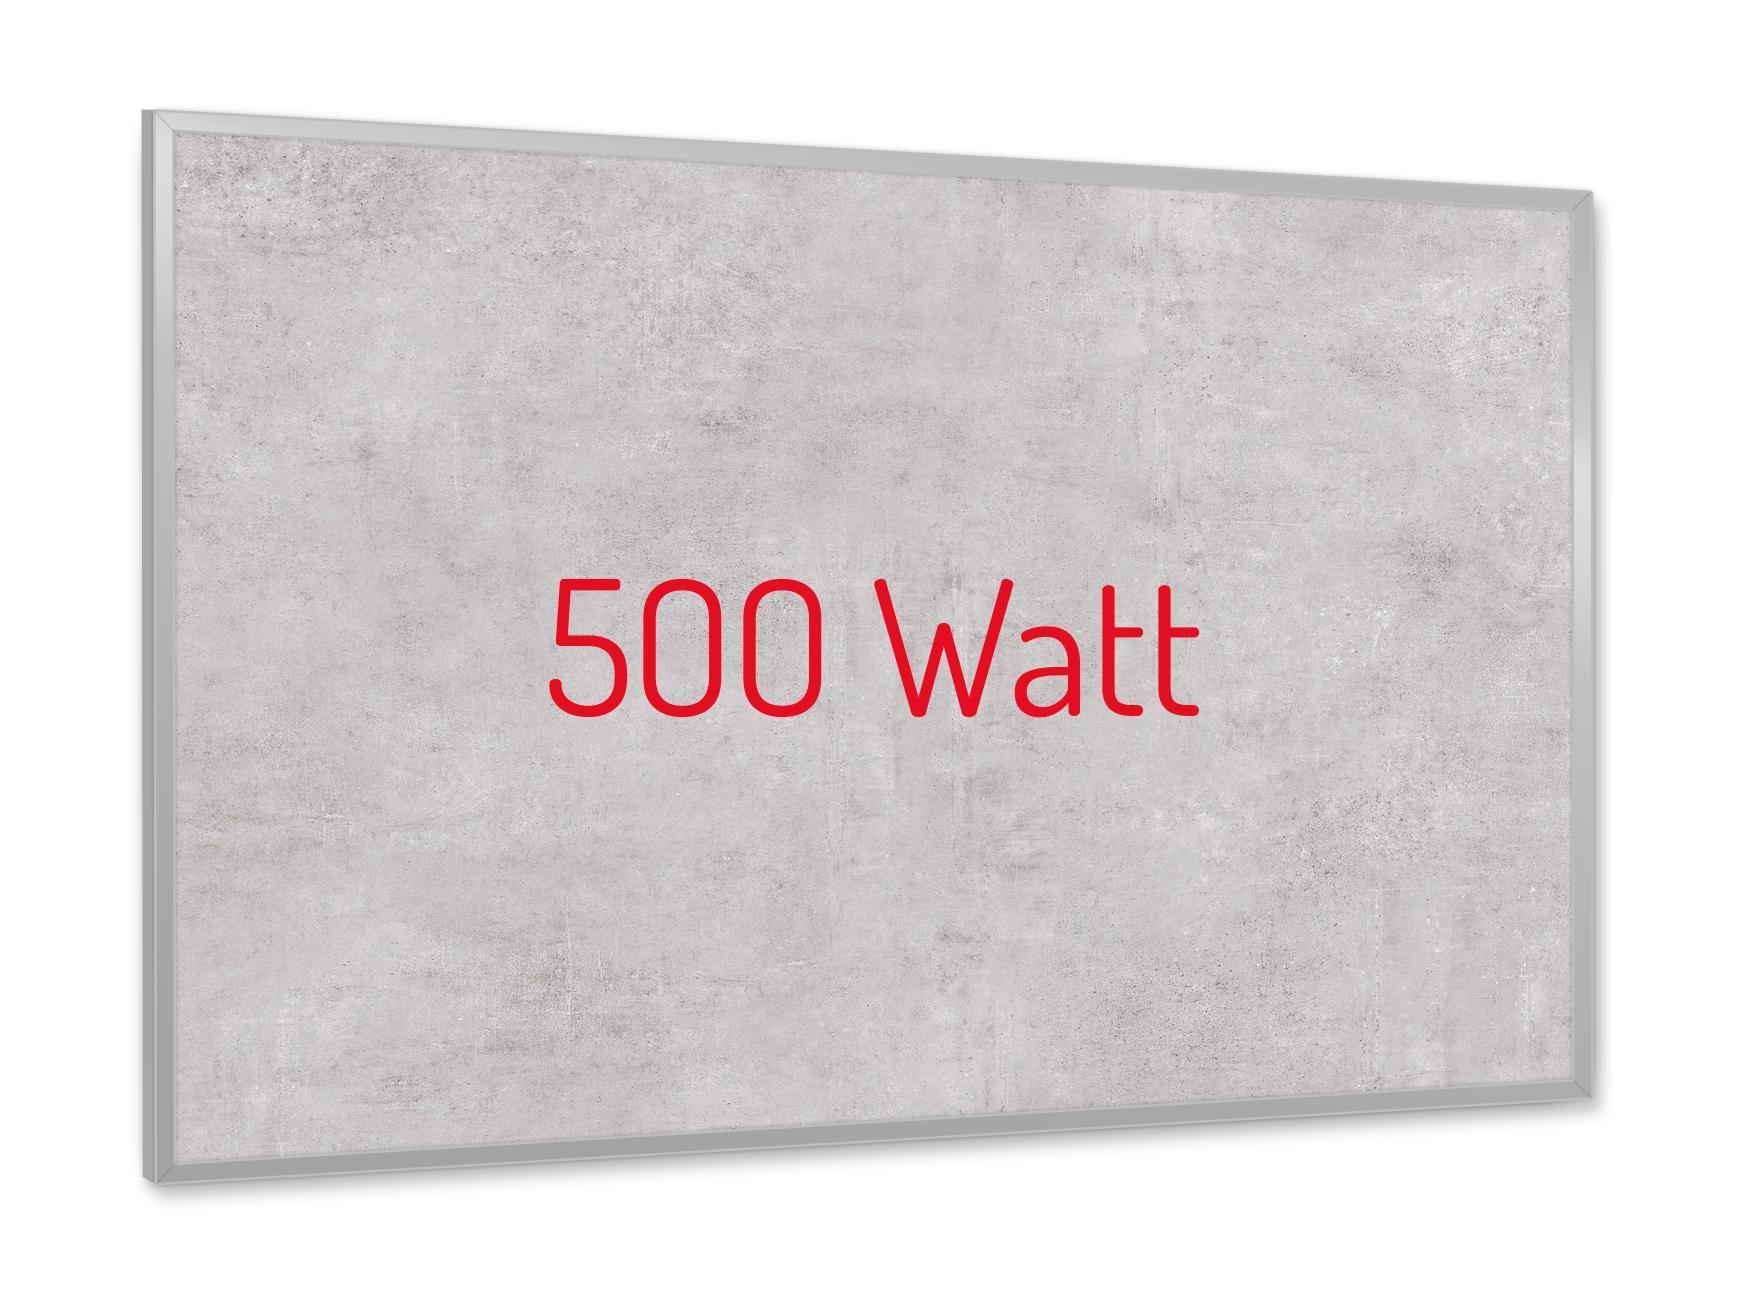 PowerSun Keramik Struktur Miami 500 Watt 60x90cm